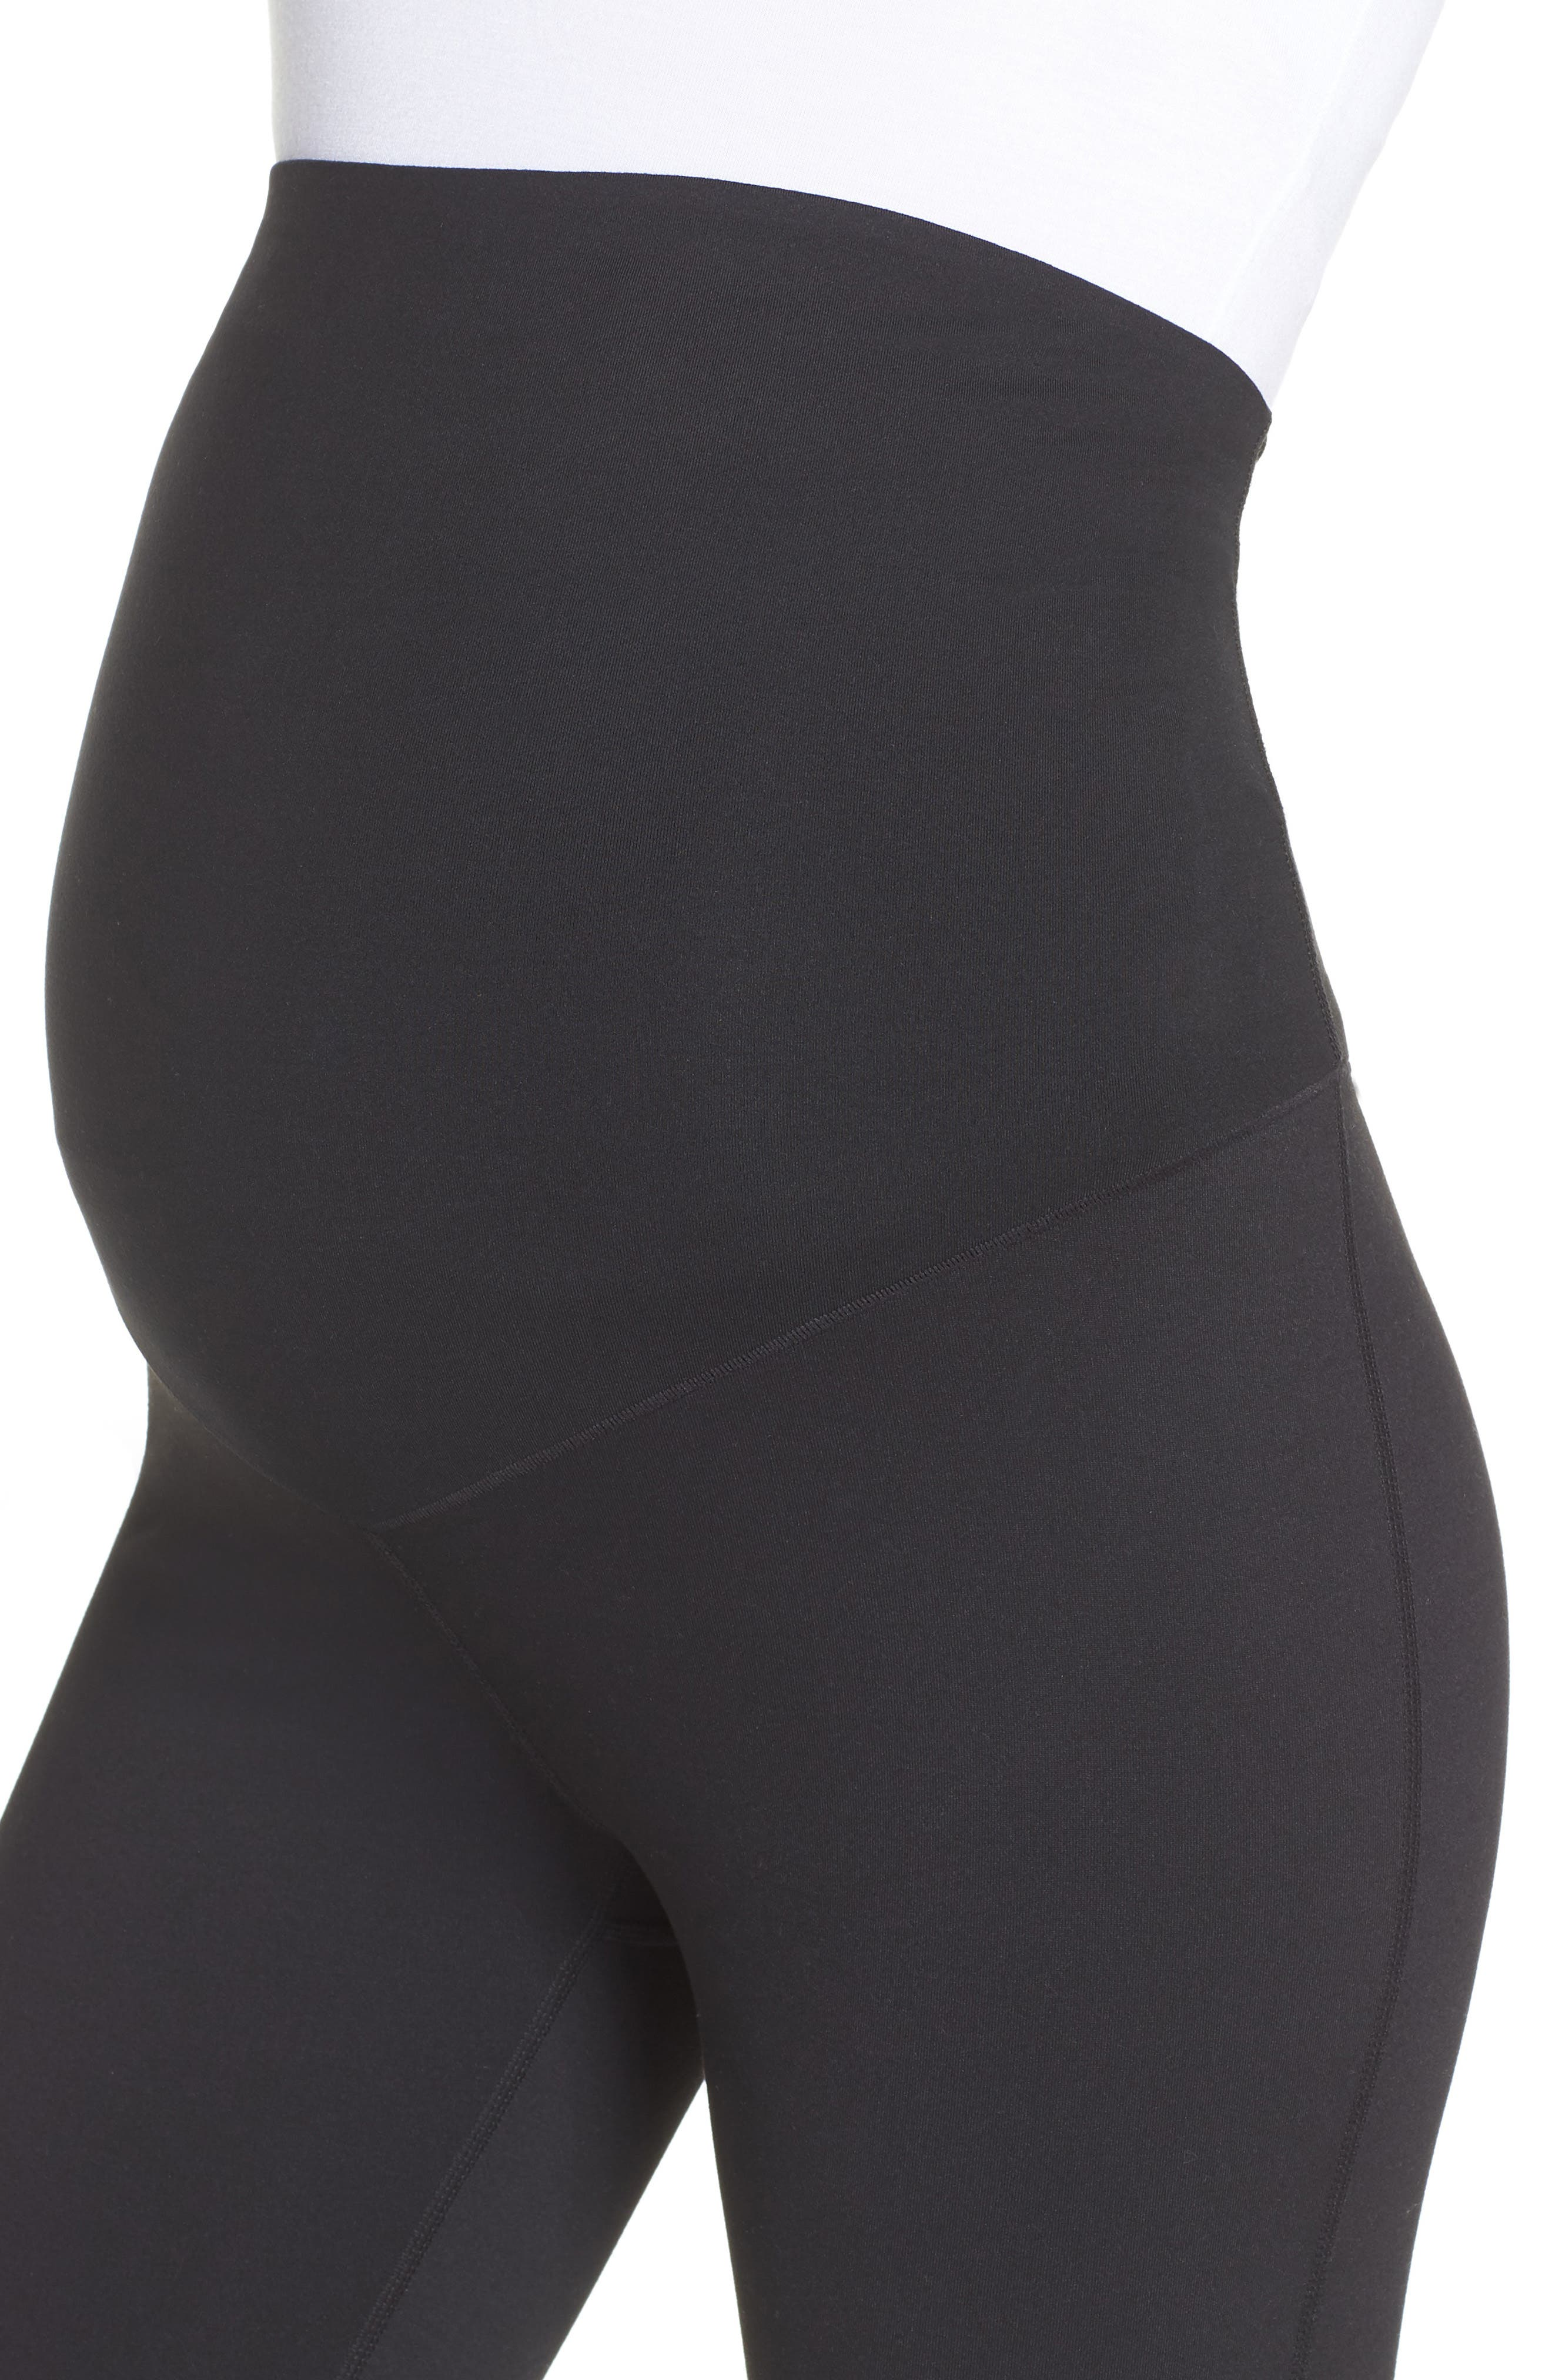 Mamasana Live In Maternity Ankle Leggings,                             Alternate thumbnail 4, color,